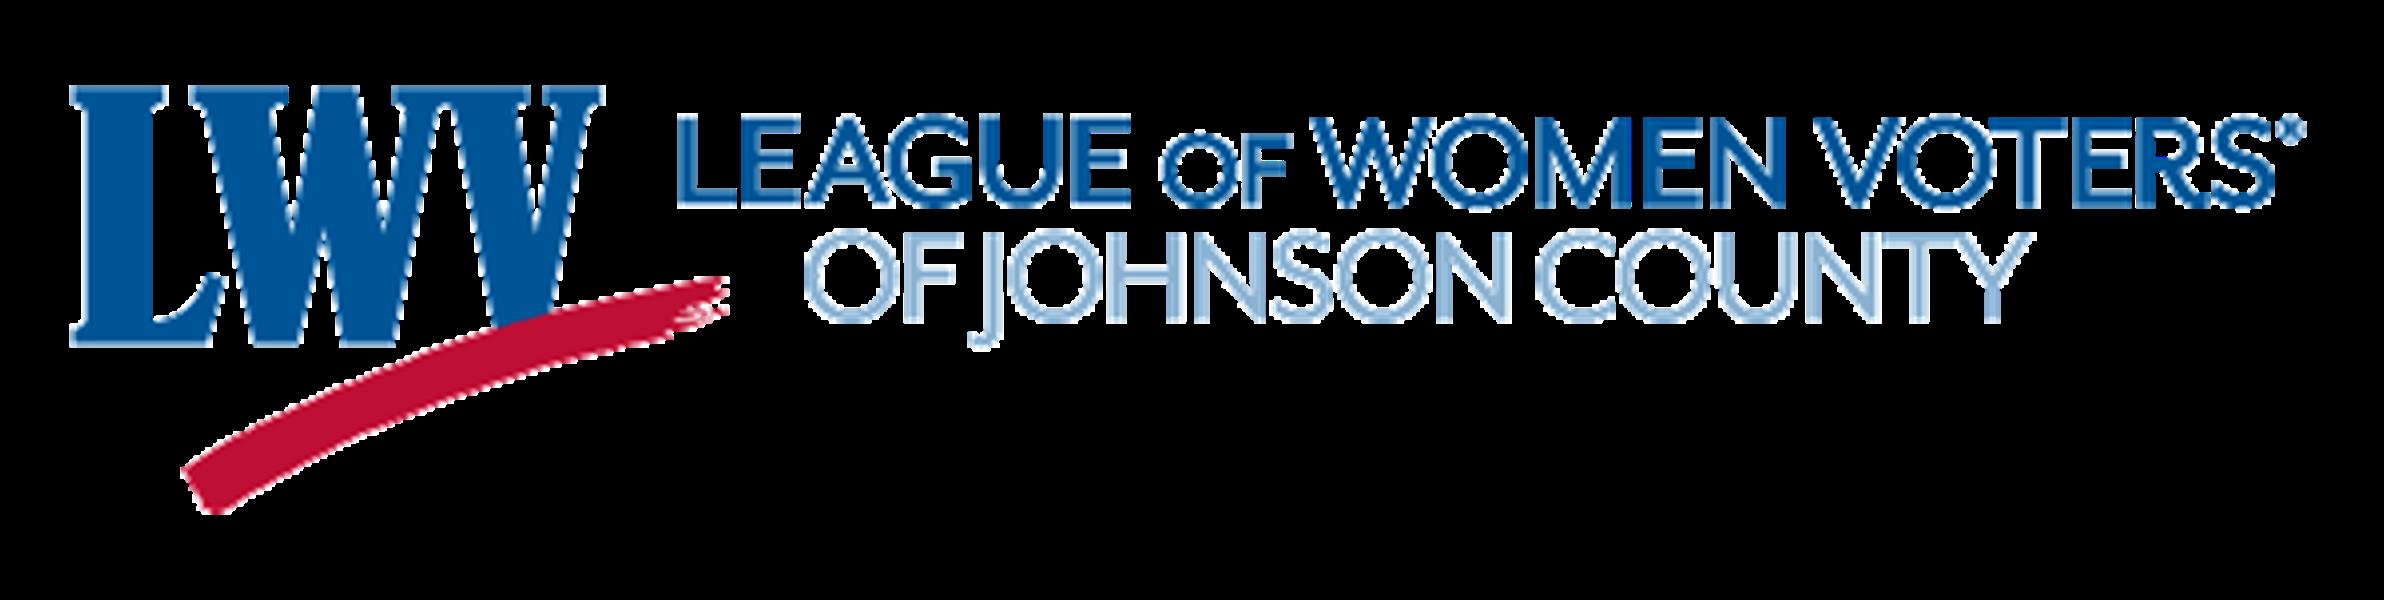 League of Women Voters of Johnson County KS